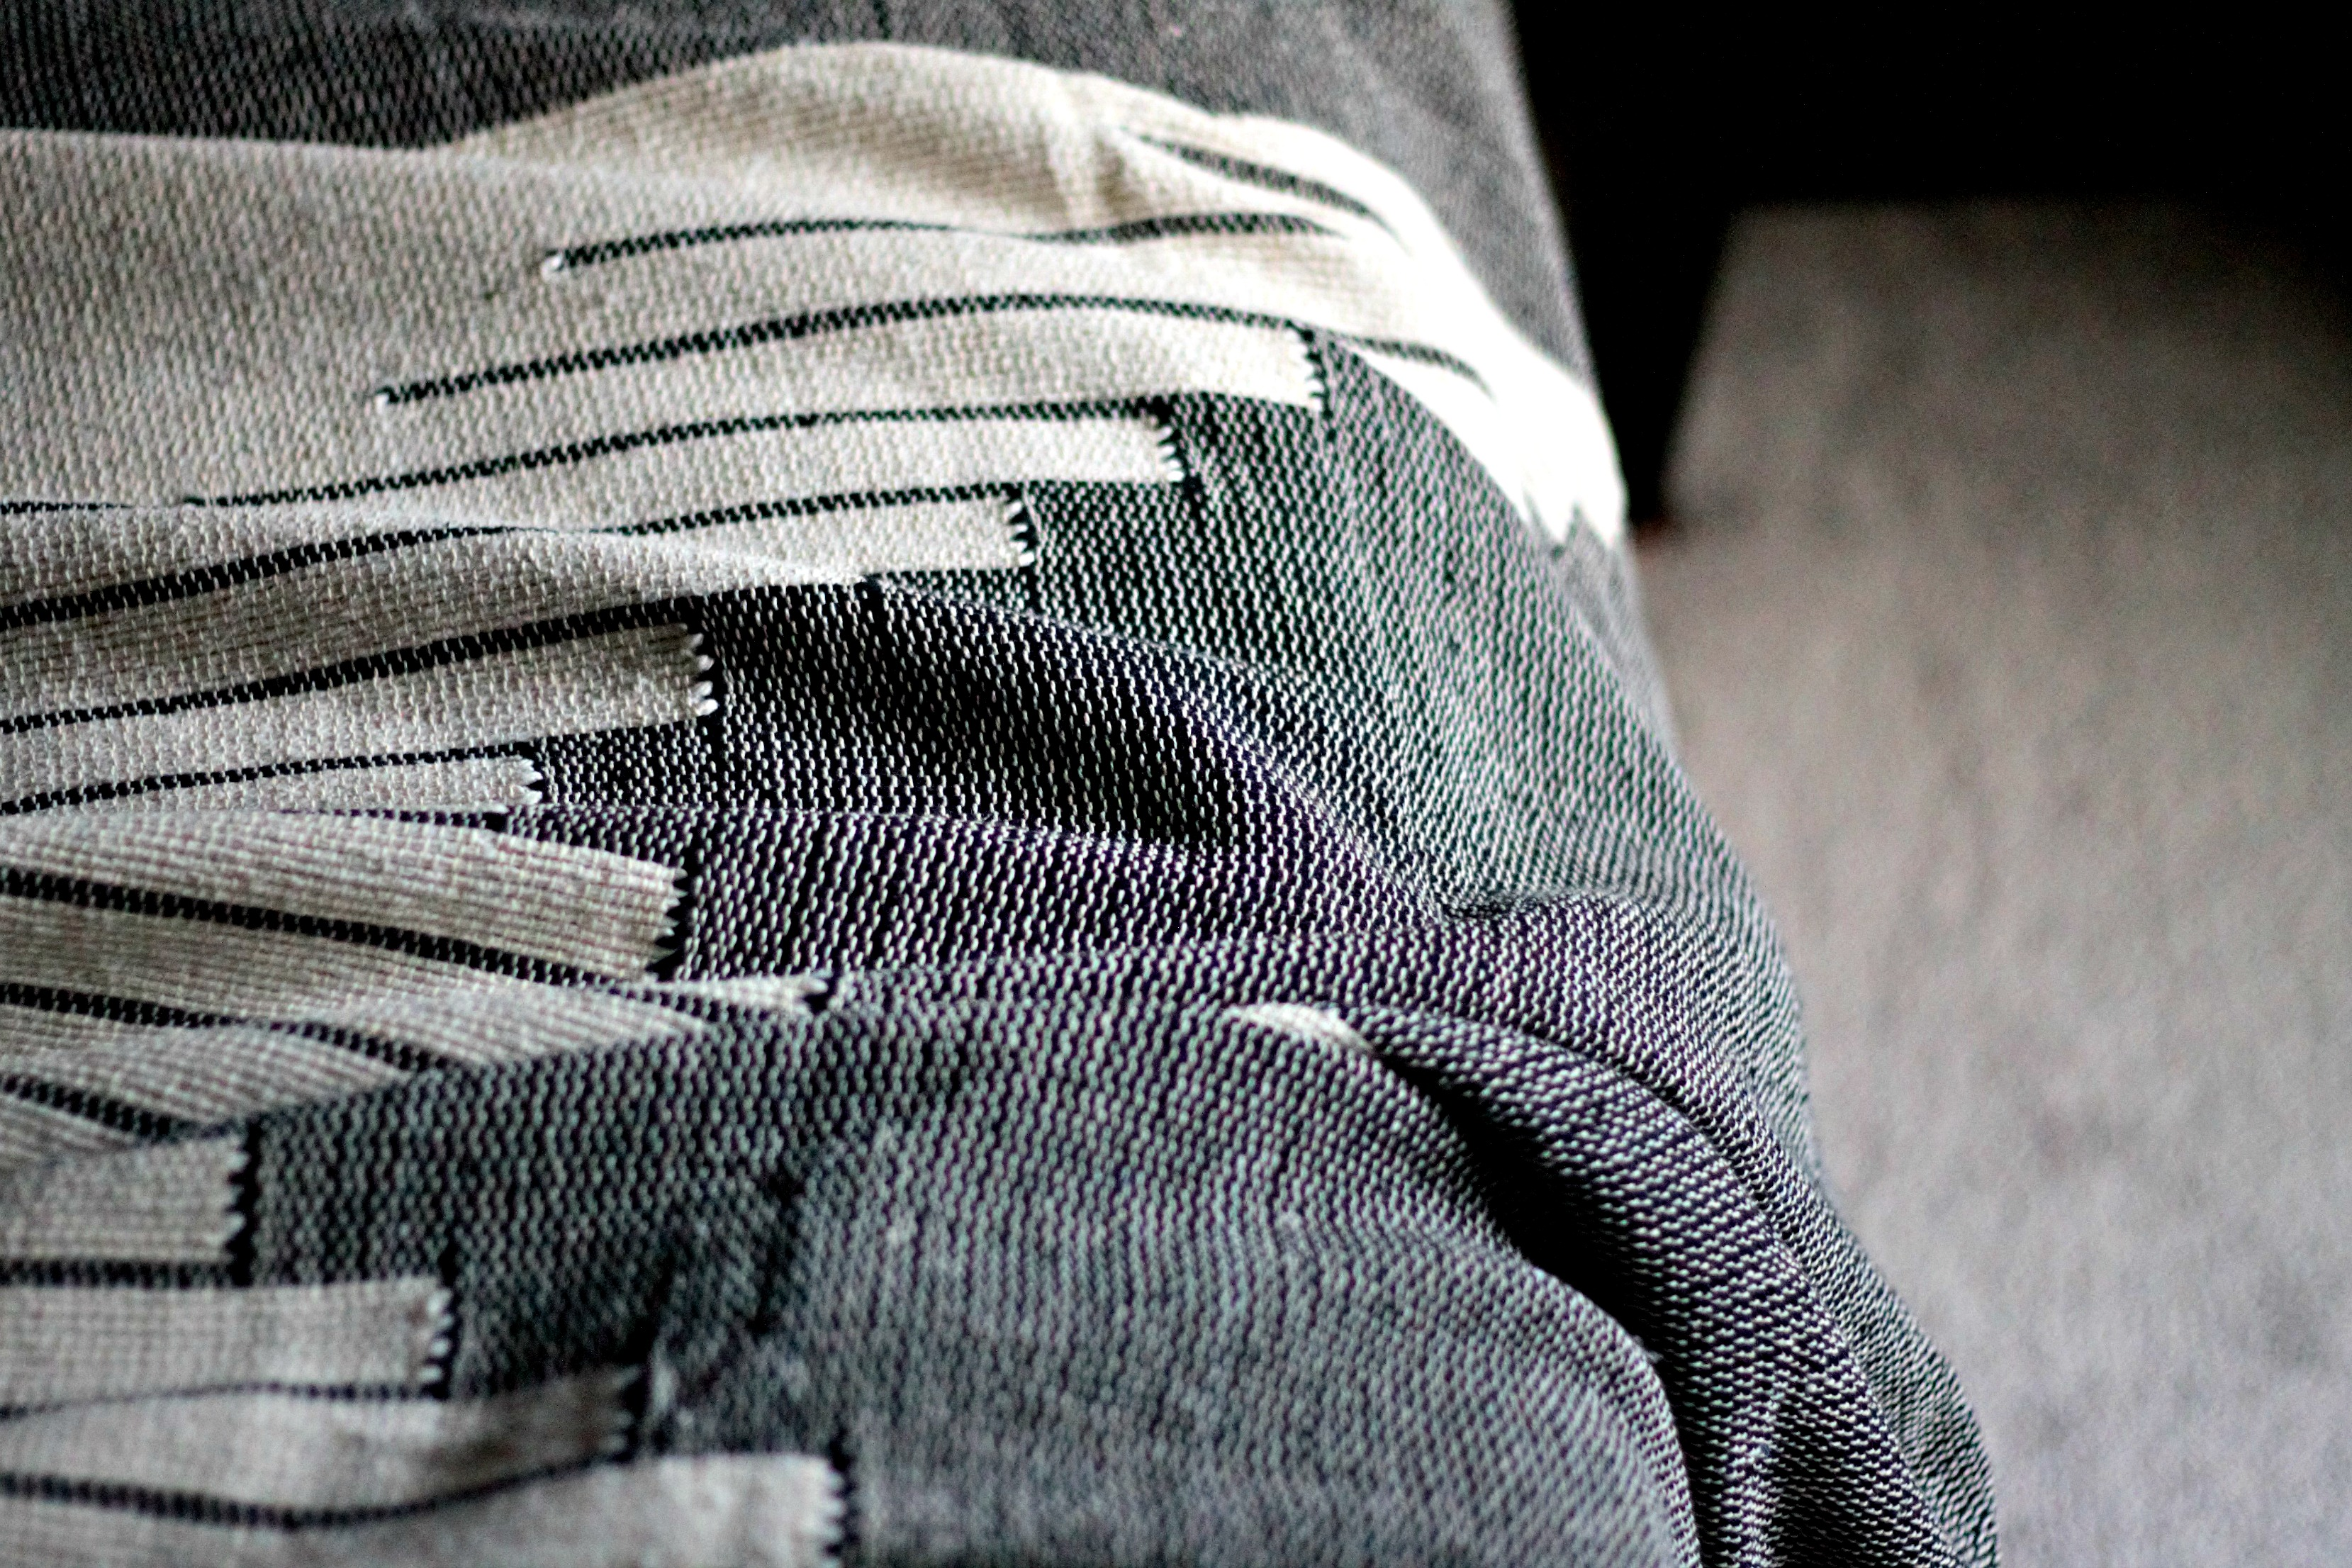 Nazca Blanket detail